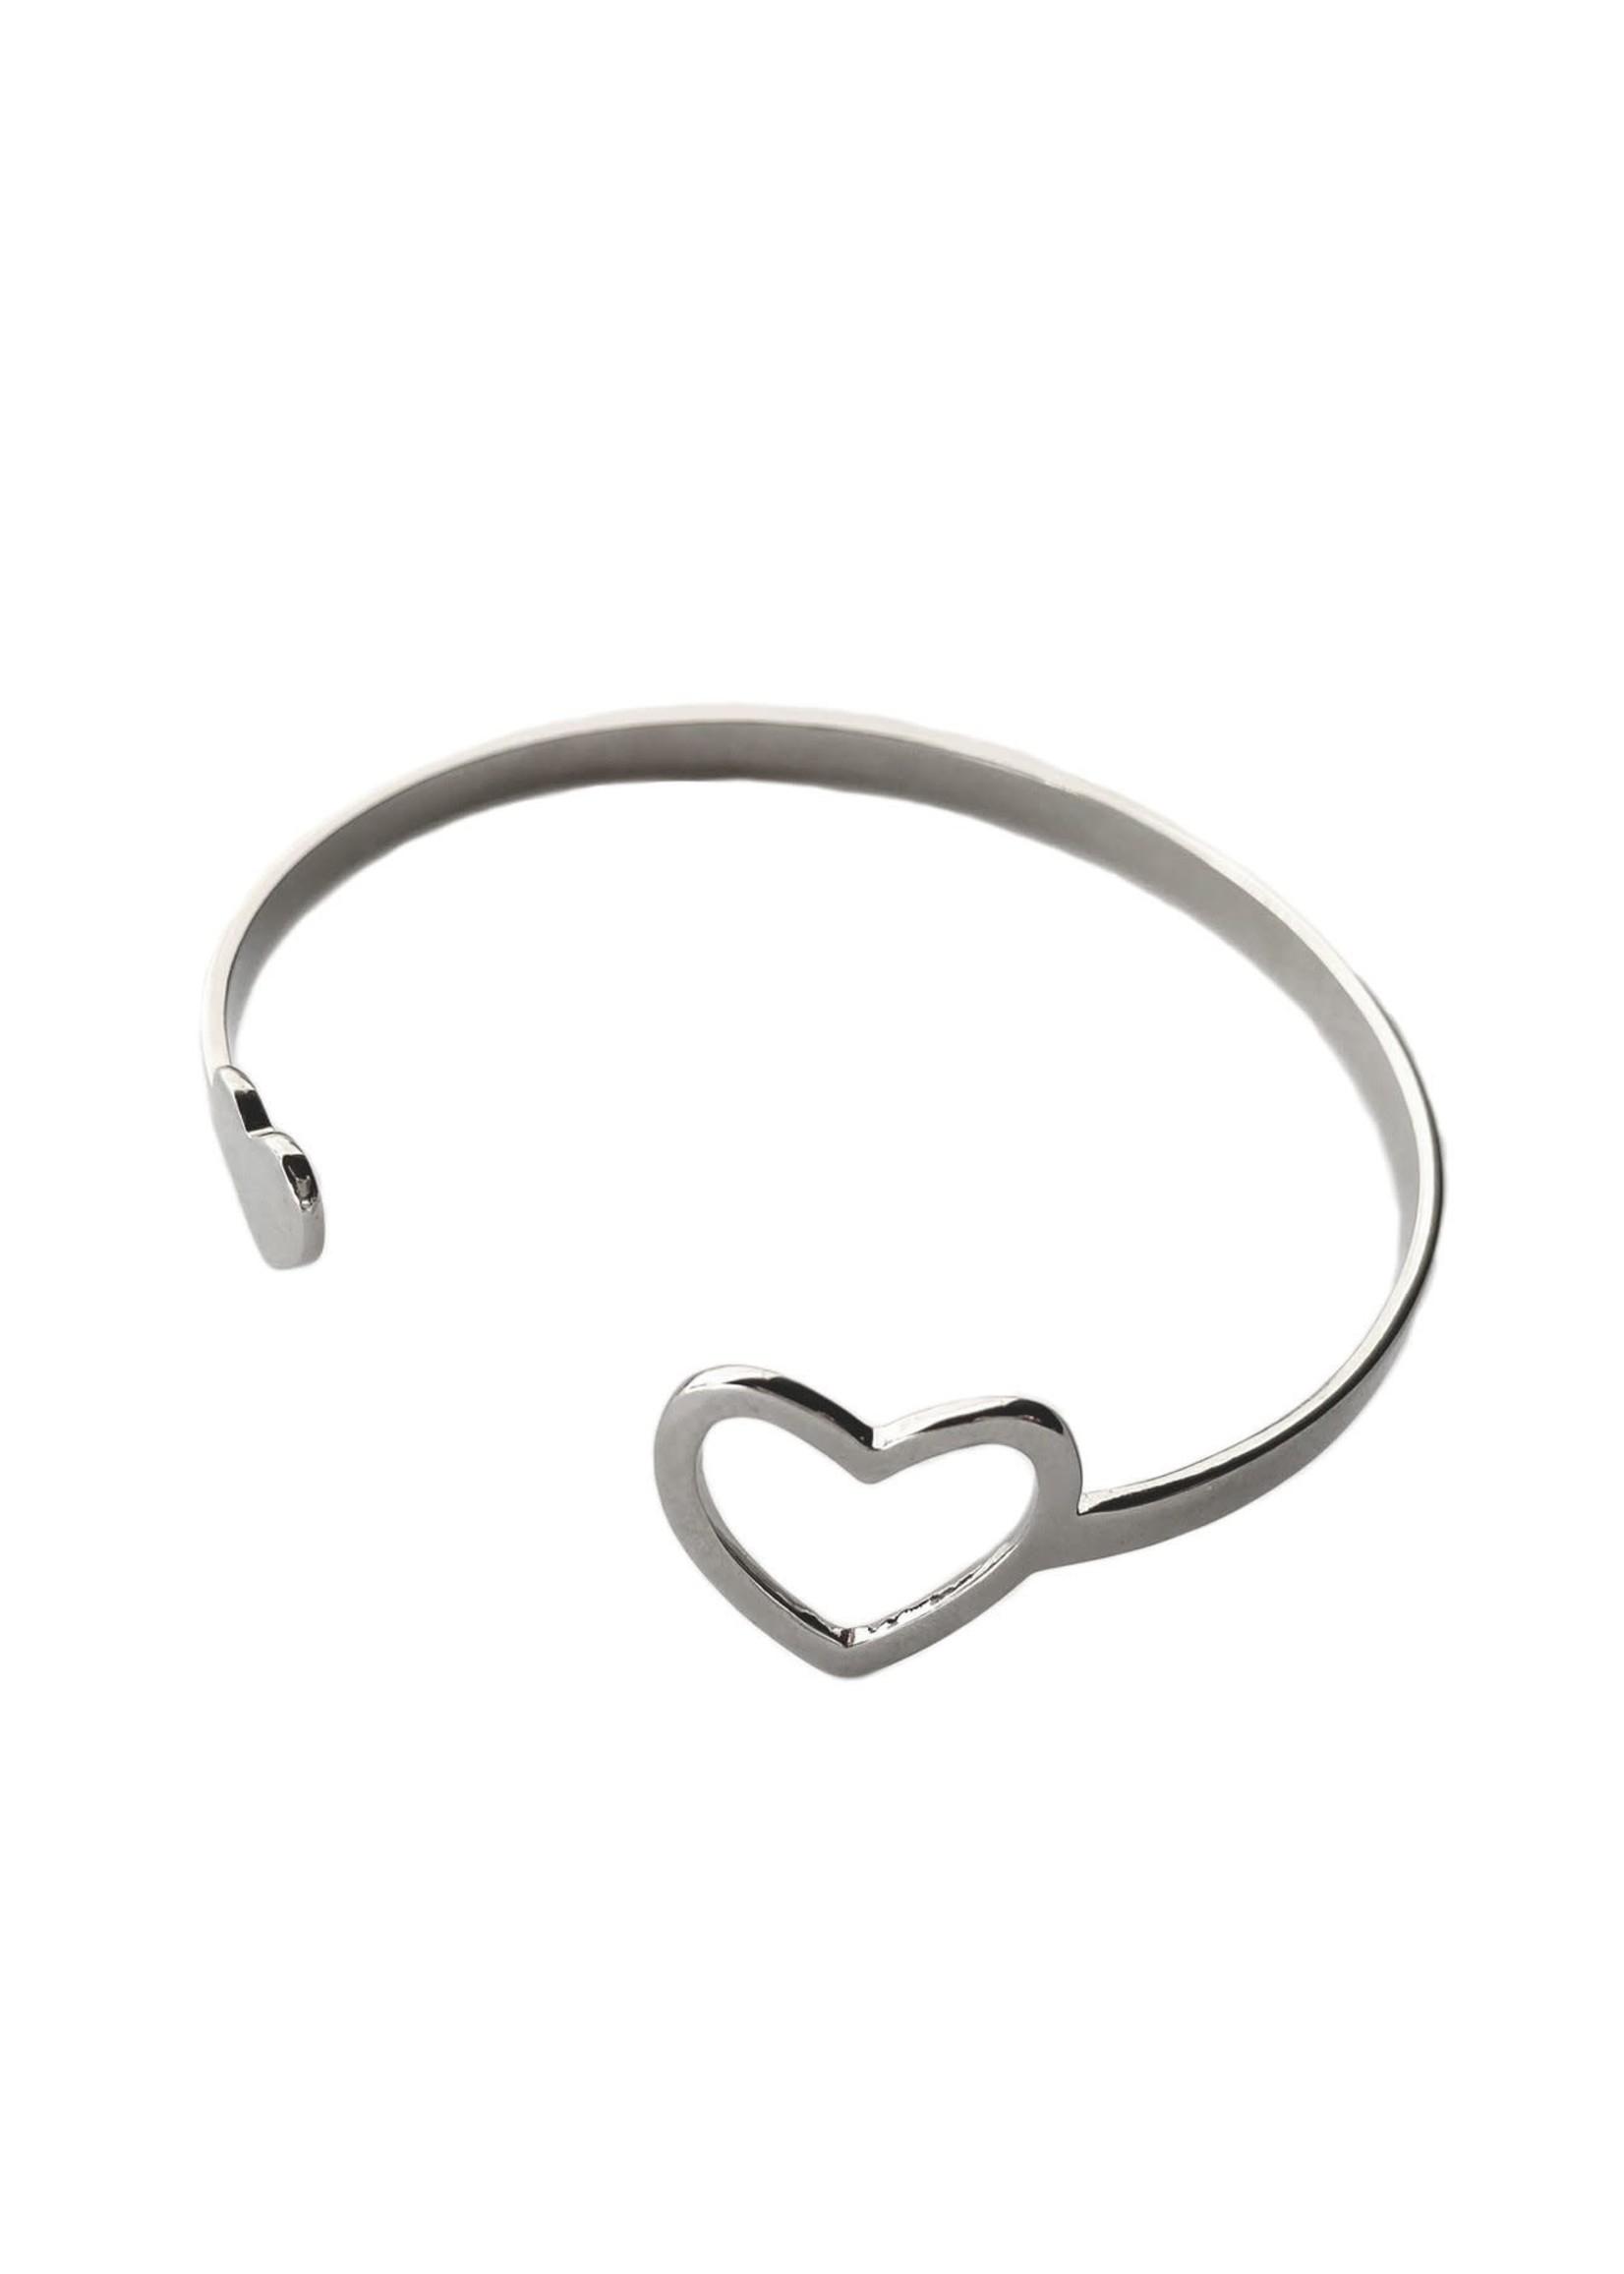 Purpose Jewelry Miracle Heart Cuff Bracelet